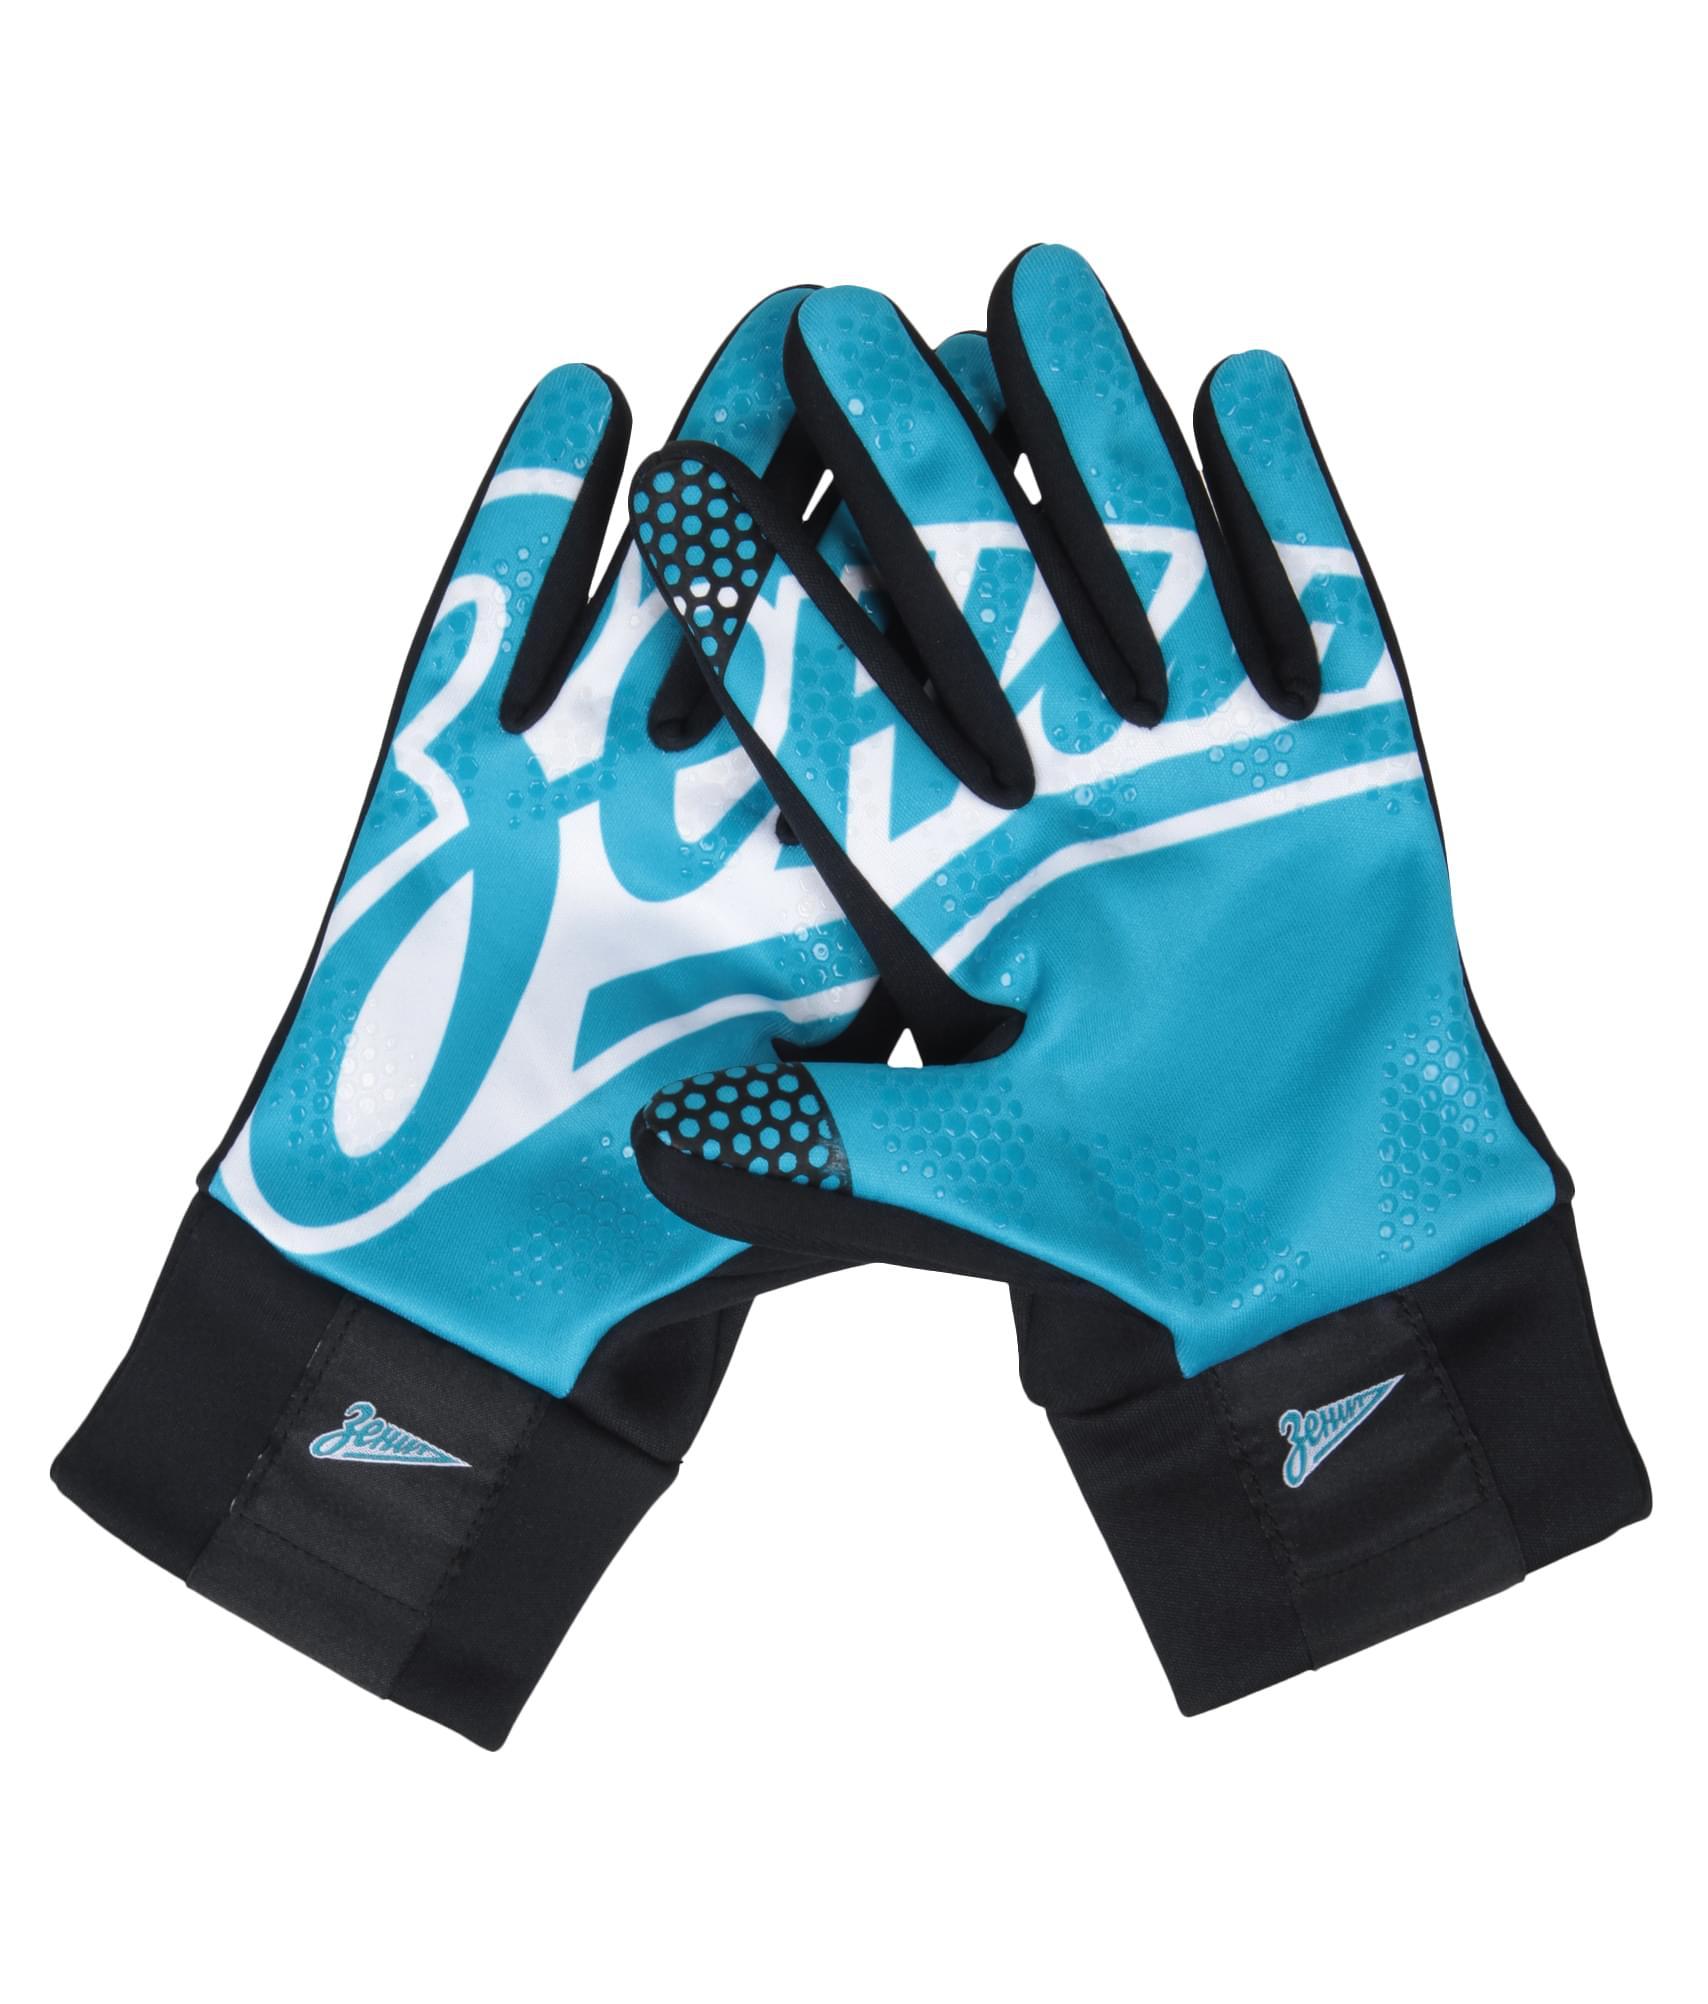 Перчатки утепленные Nike, Цвет-Черный, Размер-S